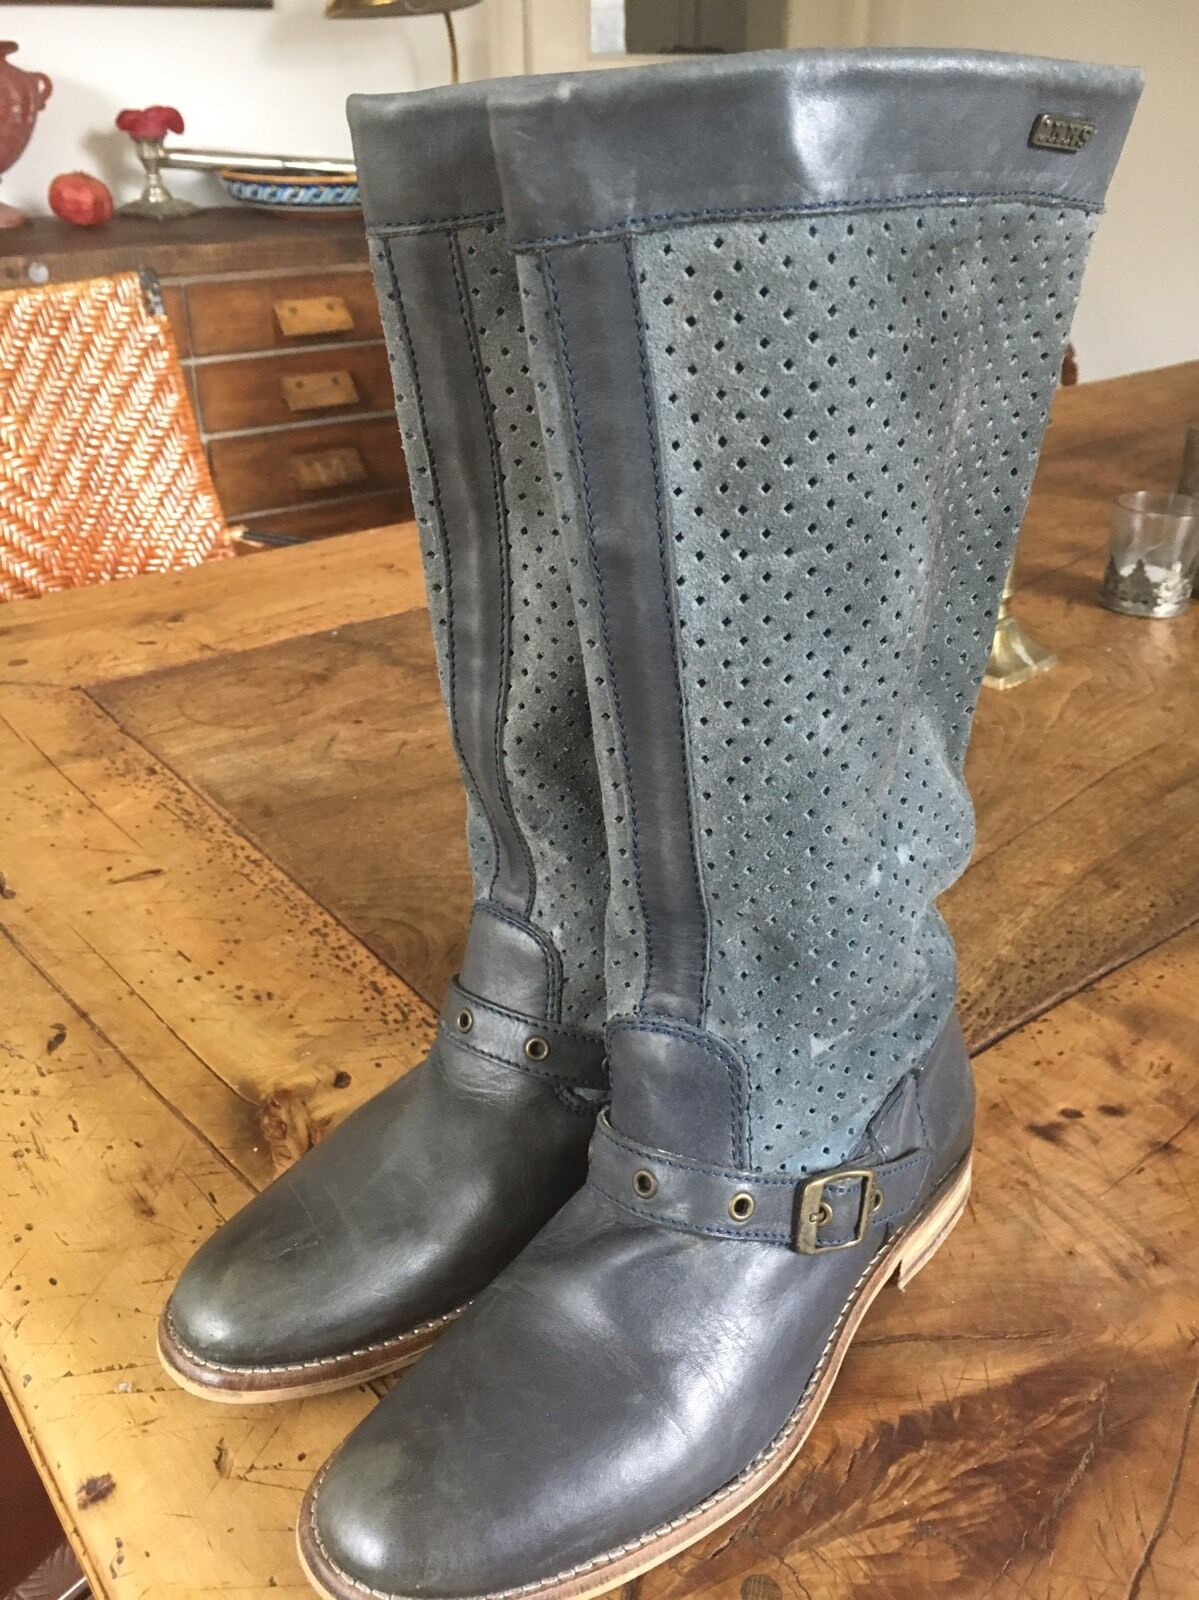 IKKS Stiefel blau grau Wildleder Leder Gr. 38 wie neu  Lochmuster